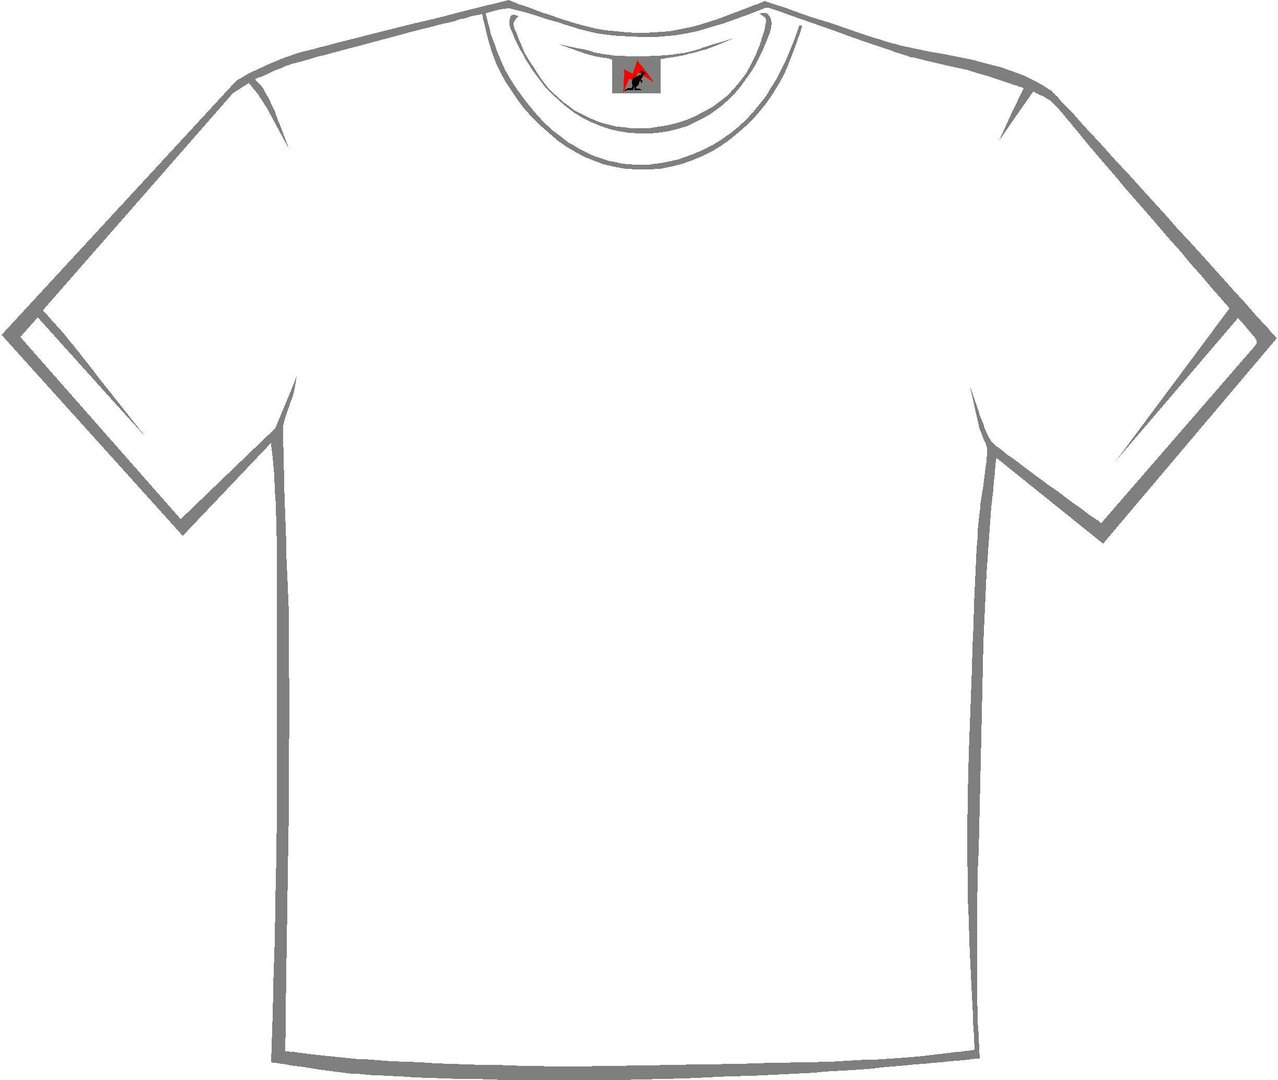 Para Imprimir Camisetas Related Keywords & Suggestions - Par